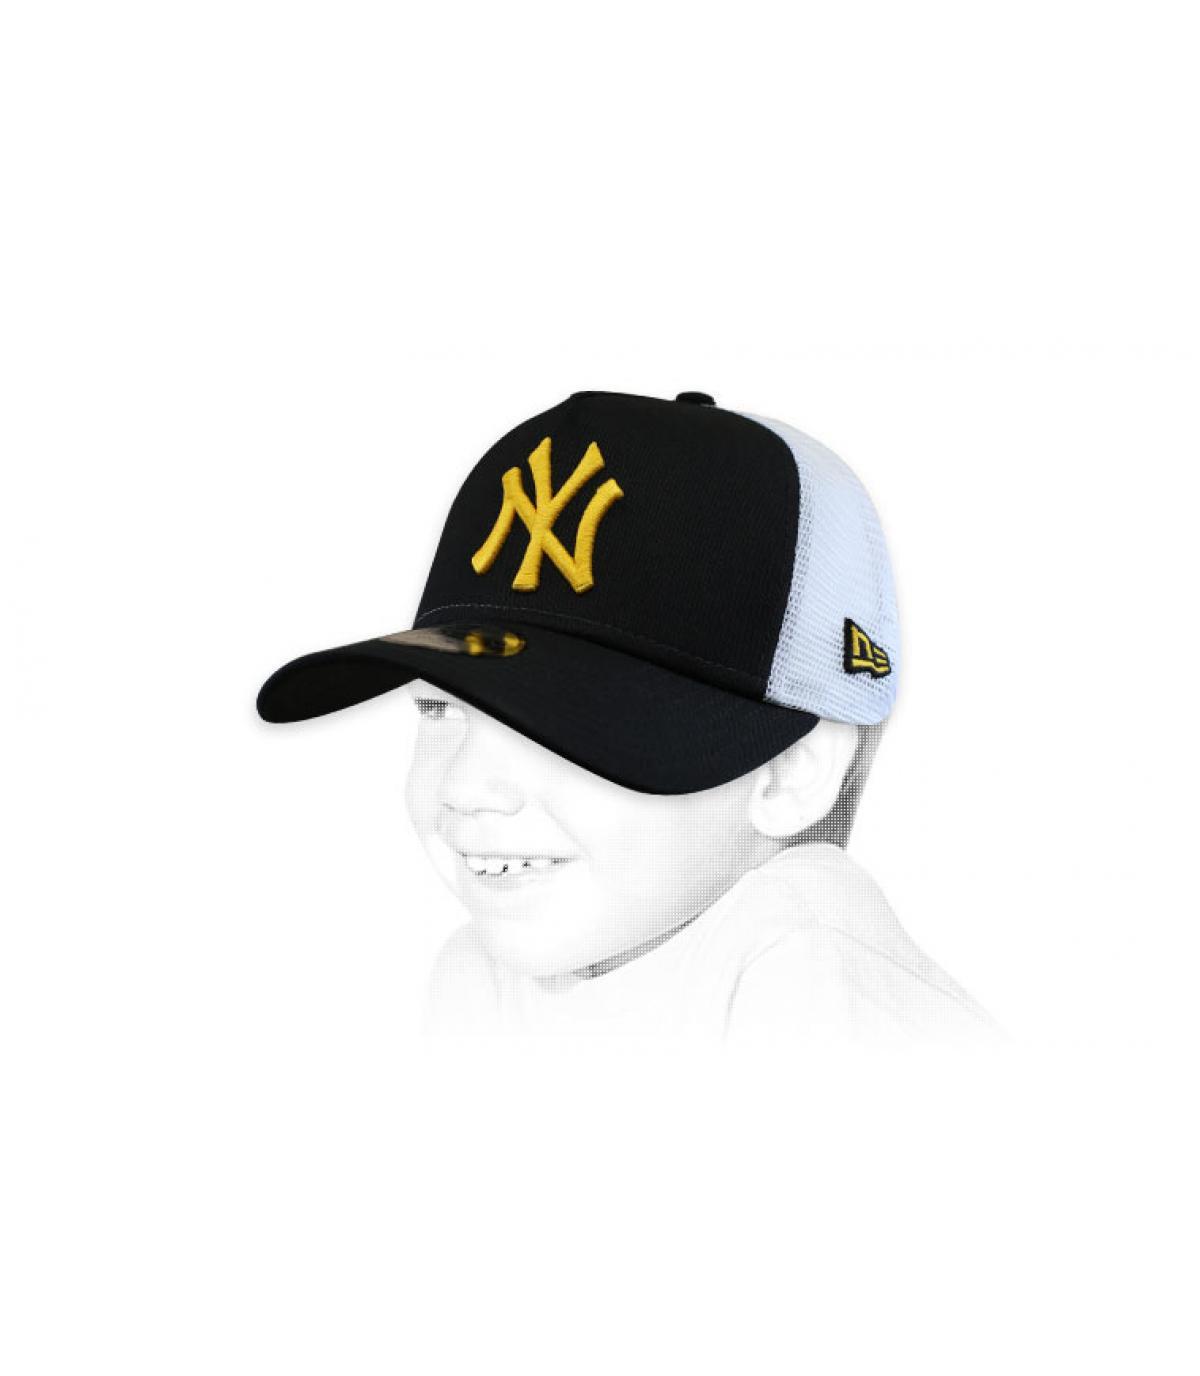 trucker enfant NY noir jaune